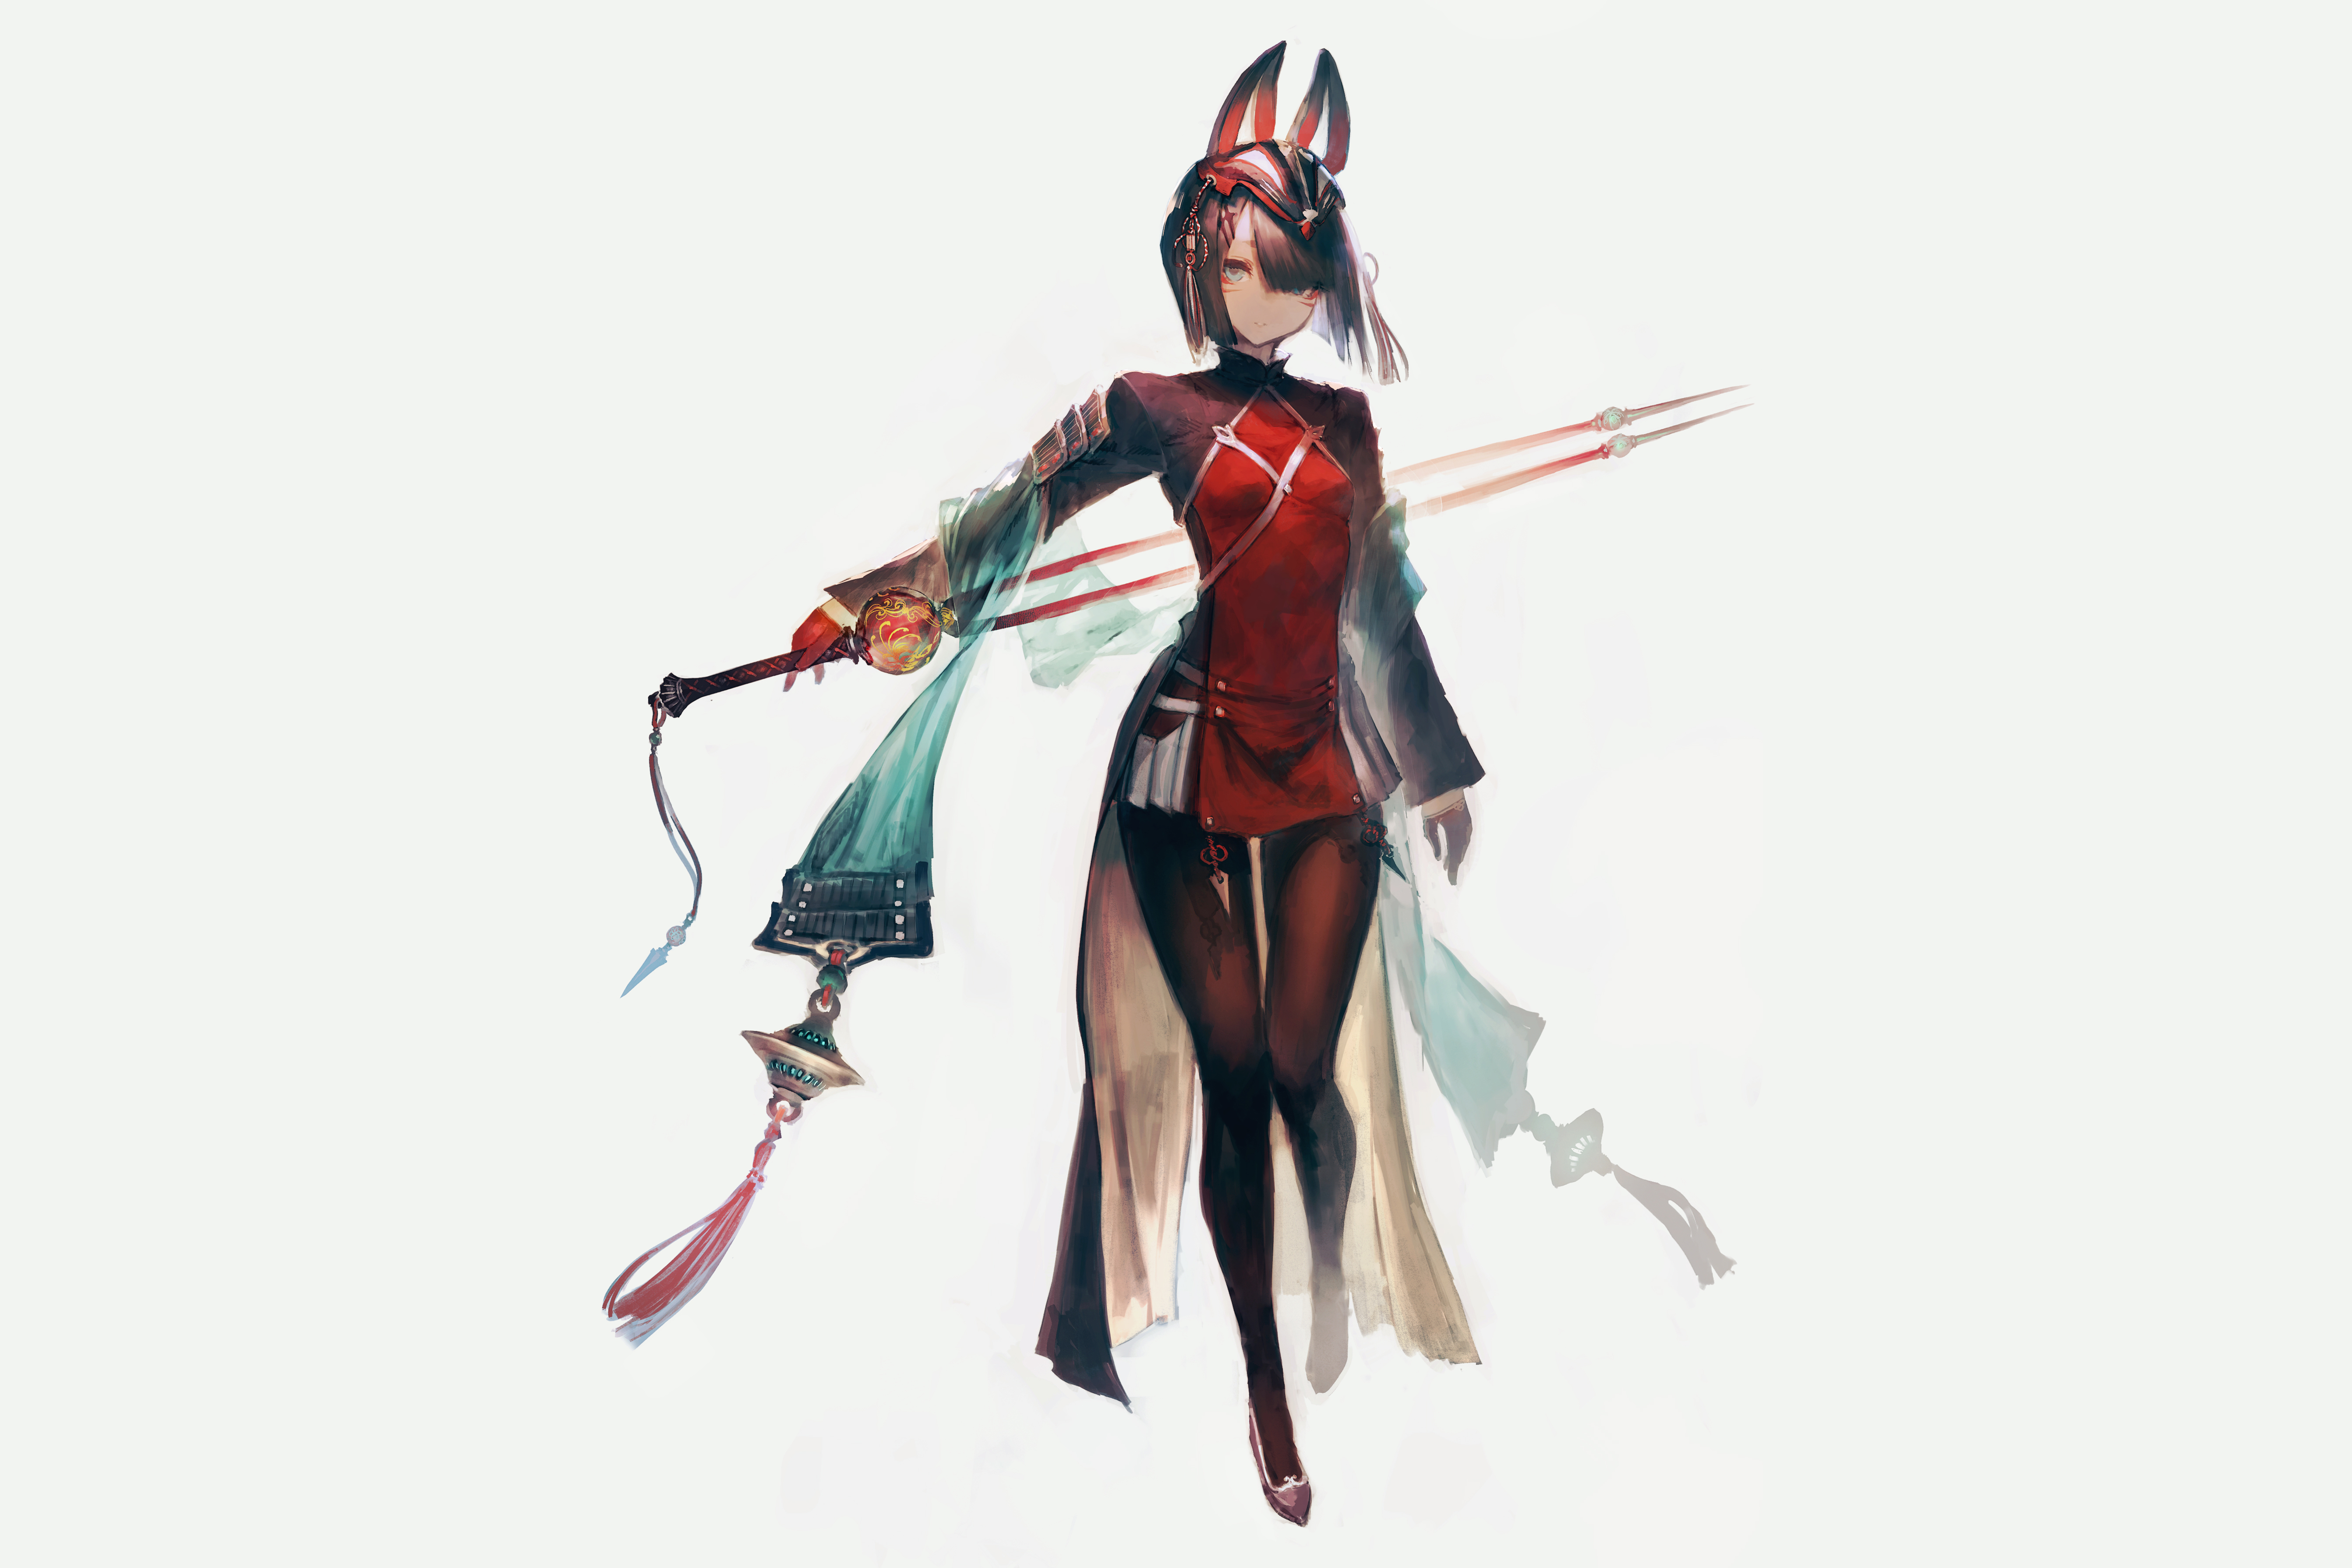 2560x1440 Cute Anime Girl With Sword 1440P Resolution HD ...